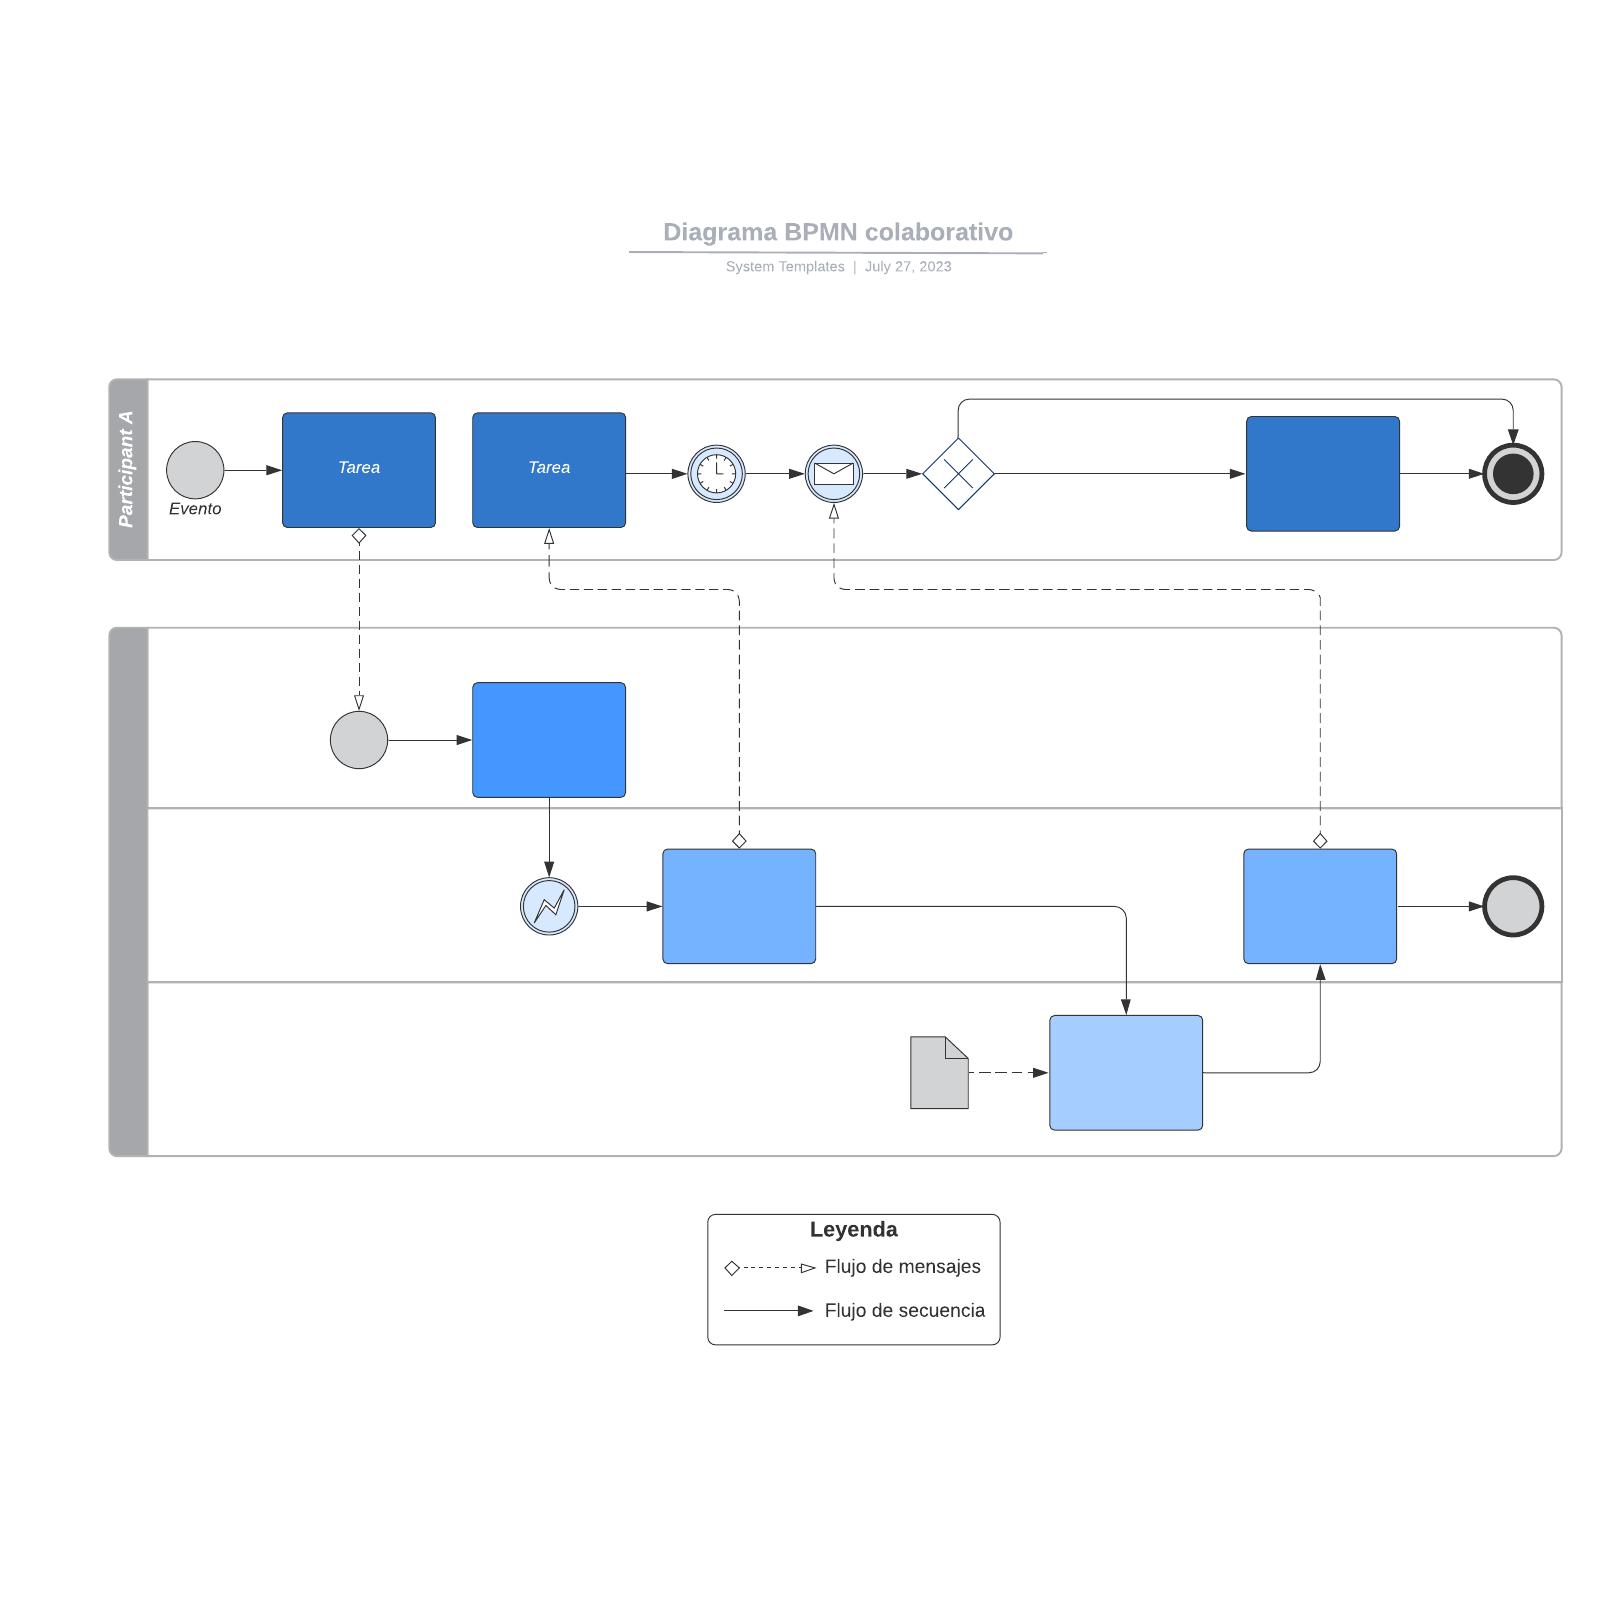 Diagrama BPMN colaborativo